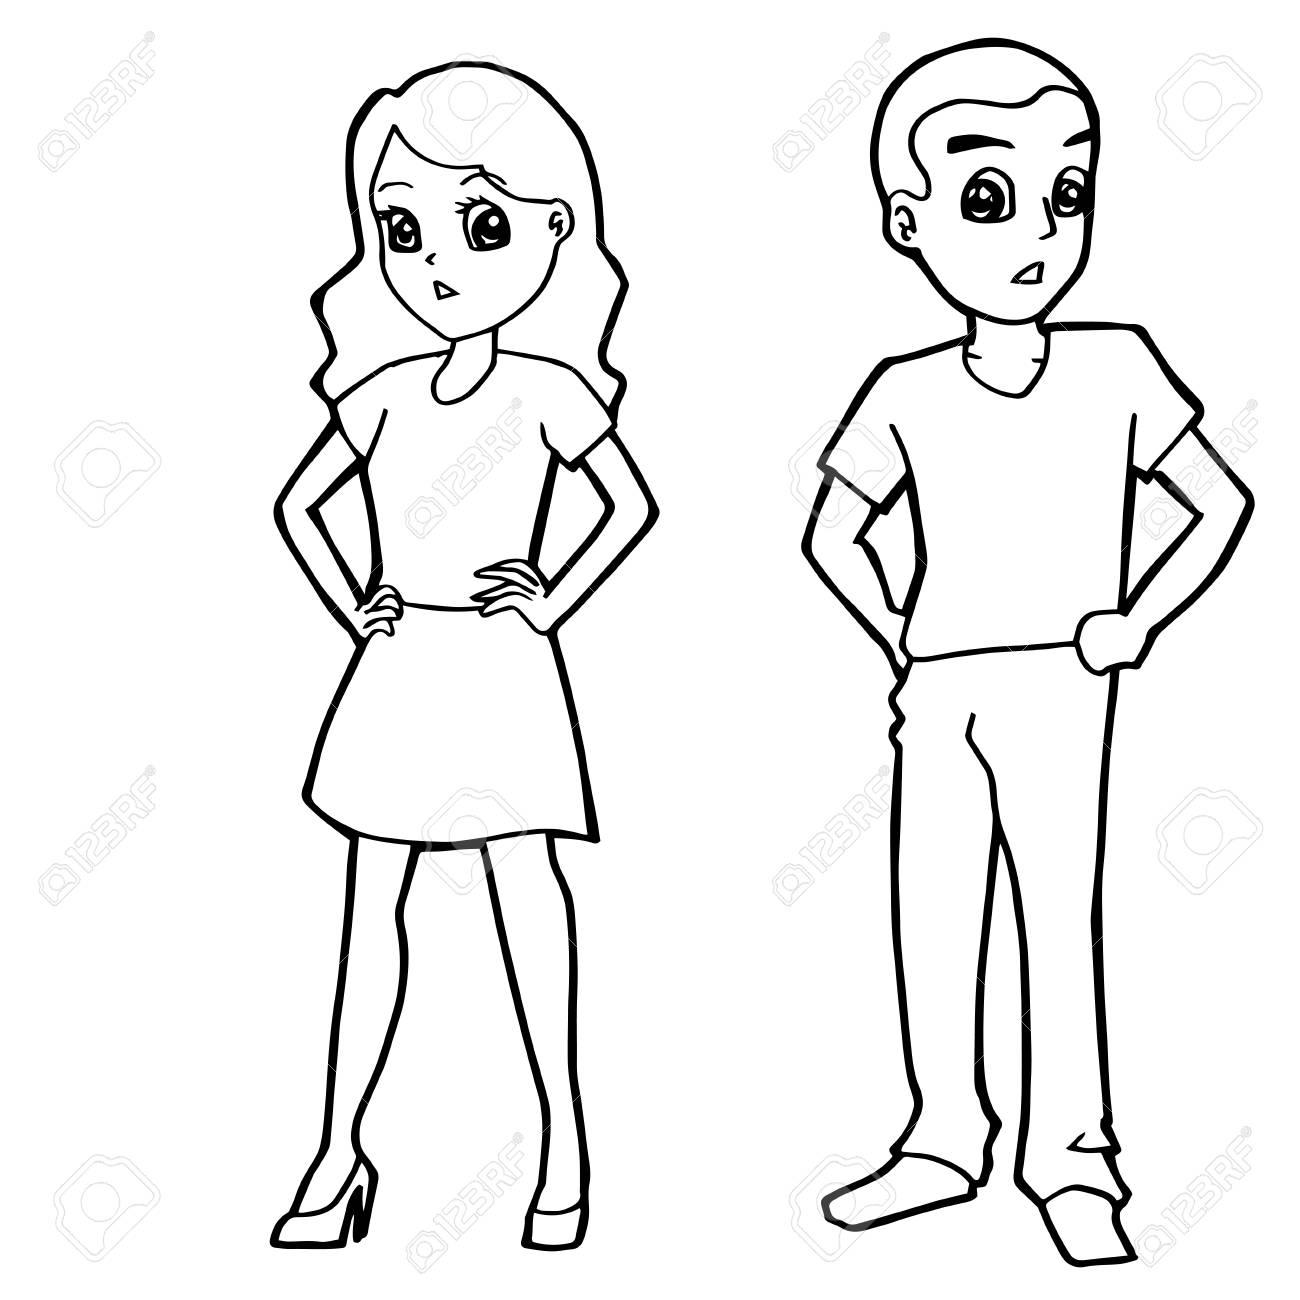 Girl and boy drawing cartoon